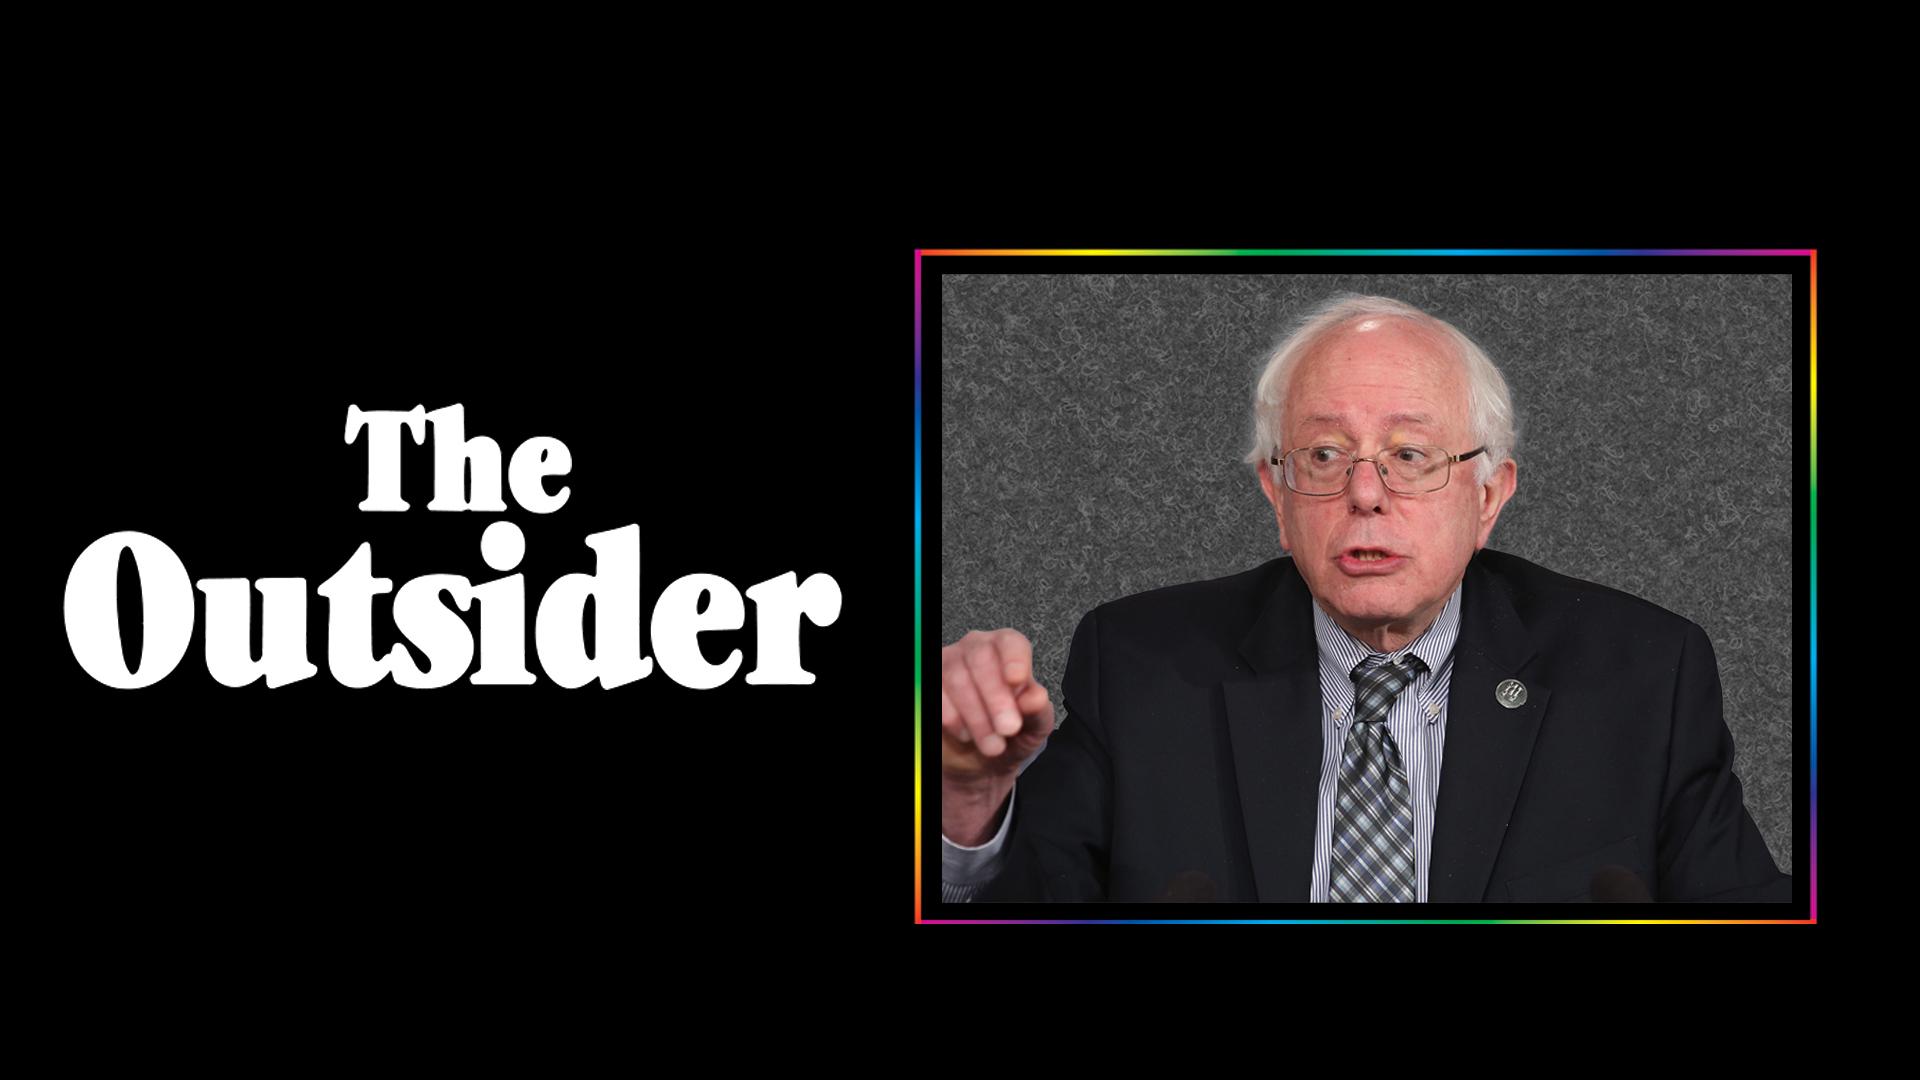 bernie sanders is scary bloomberg politics